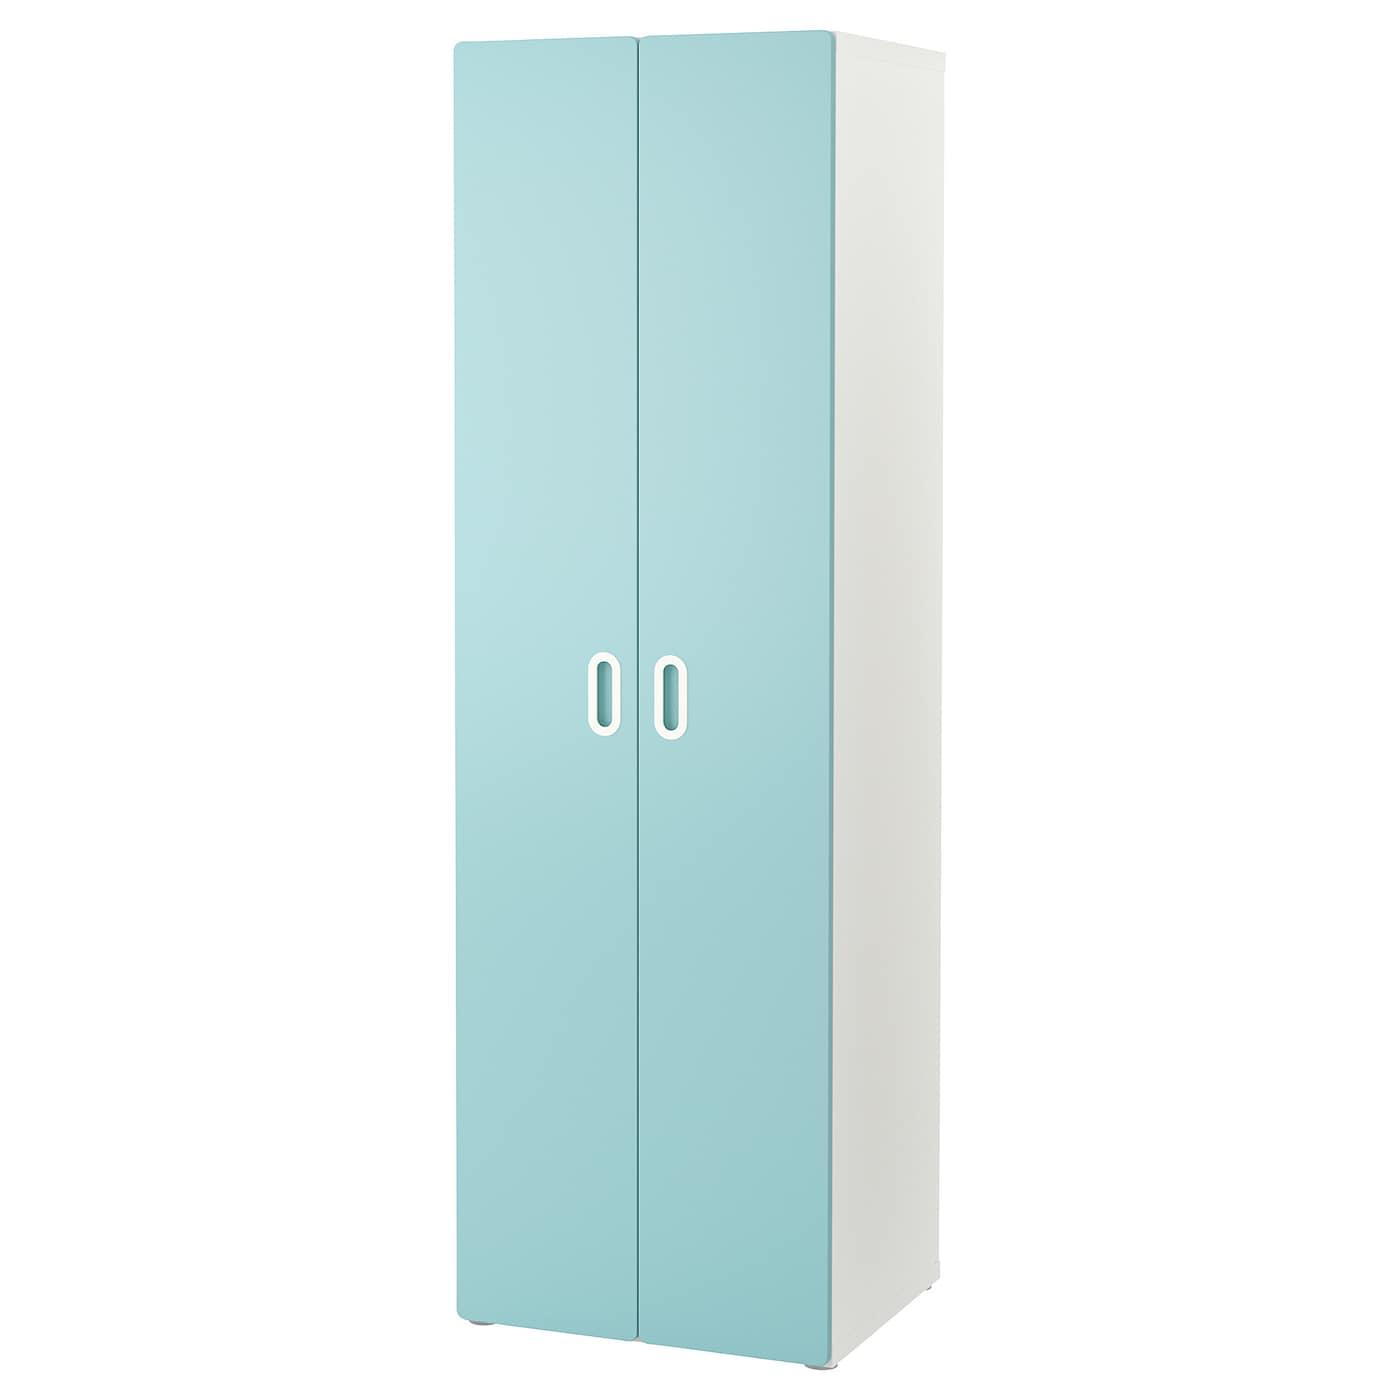 FRITIDS/STUVA Wardrobe White/light blue 60 x 50 x 192 cm - IKEA